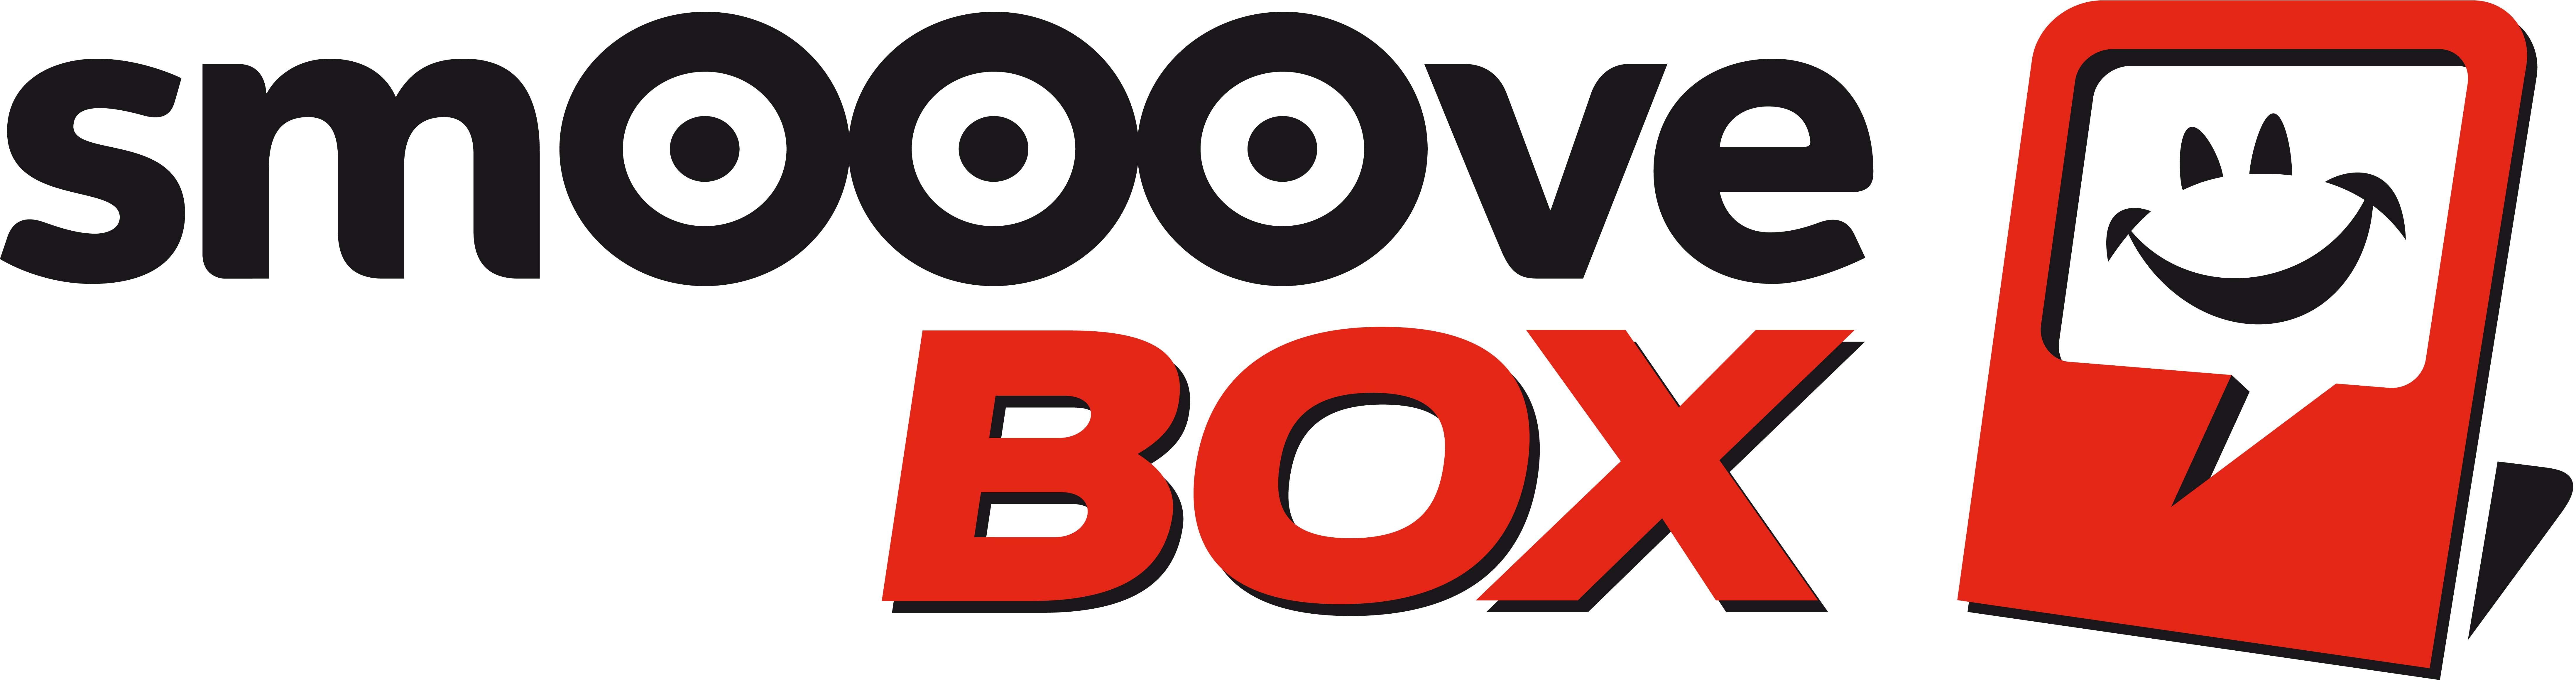 Smoovebox